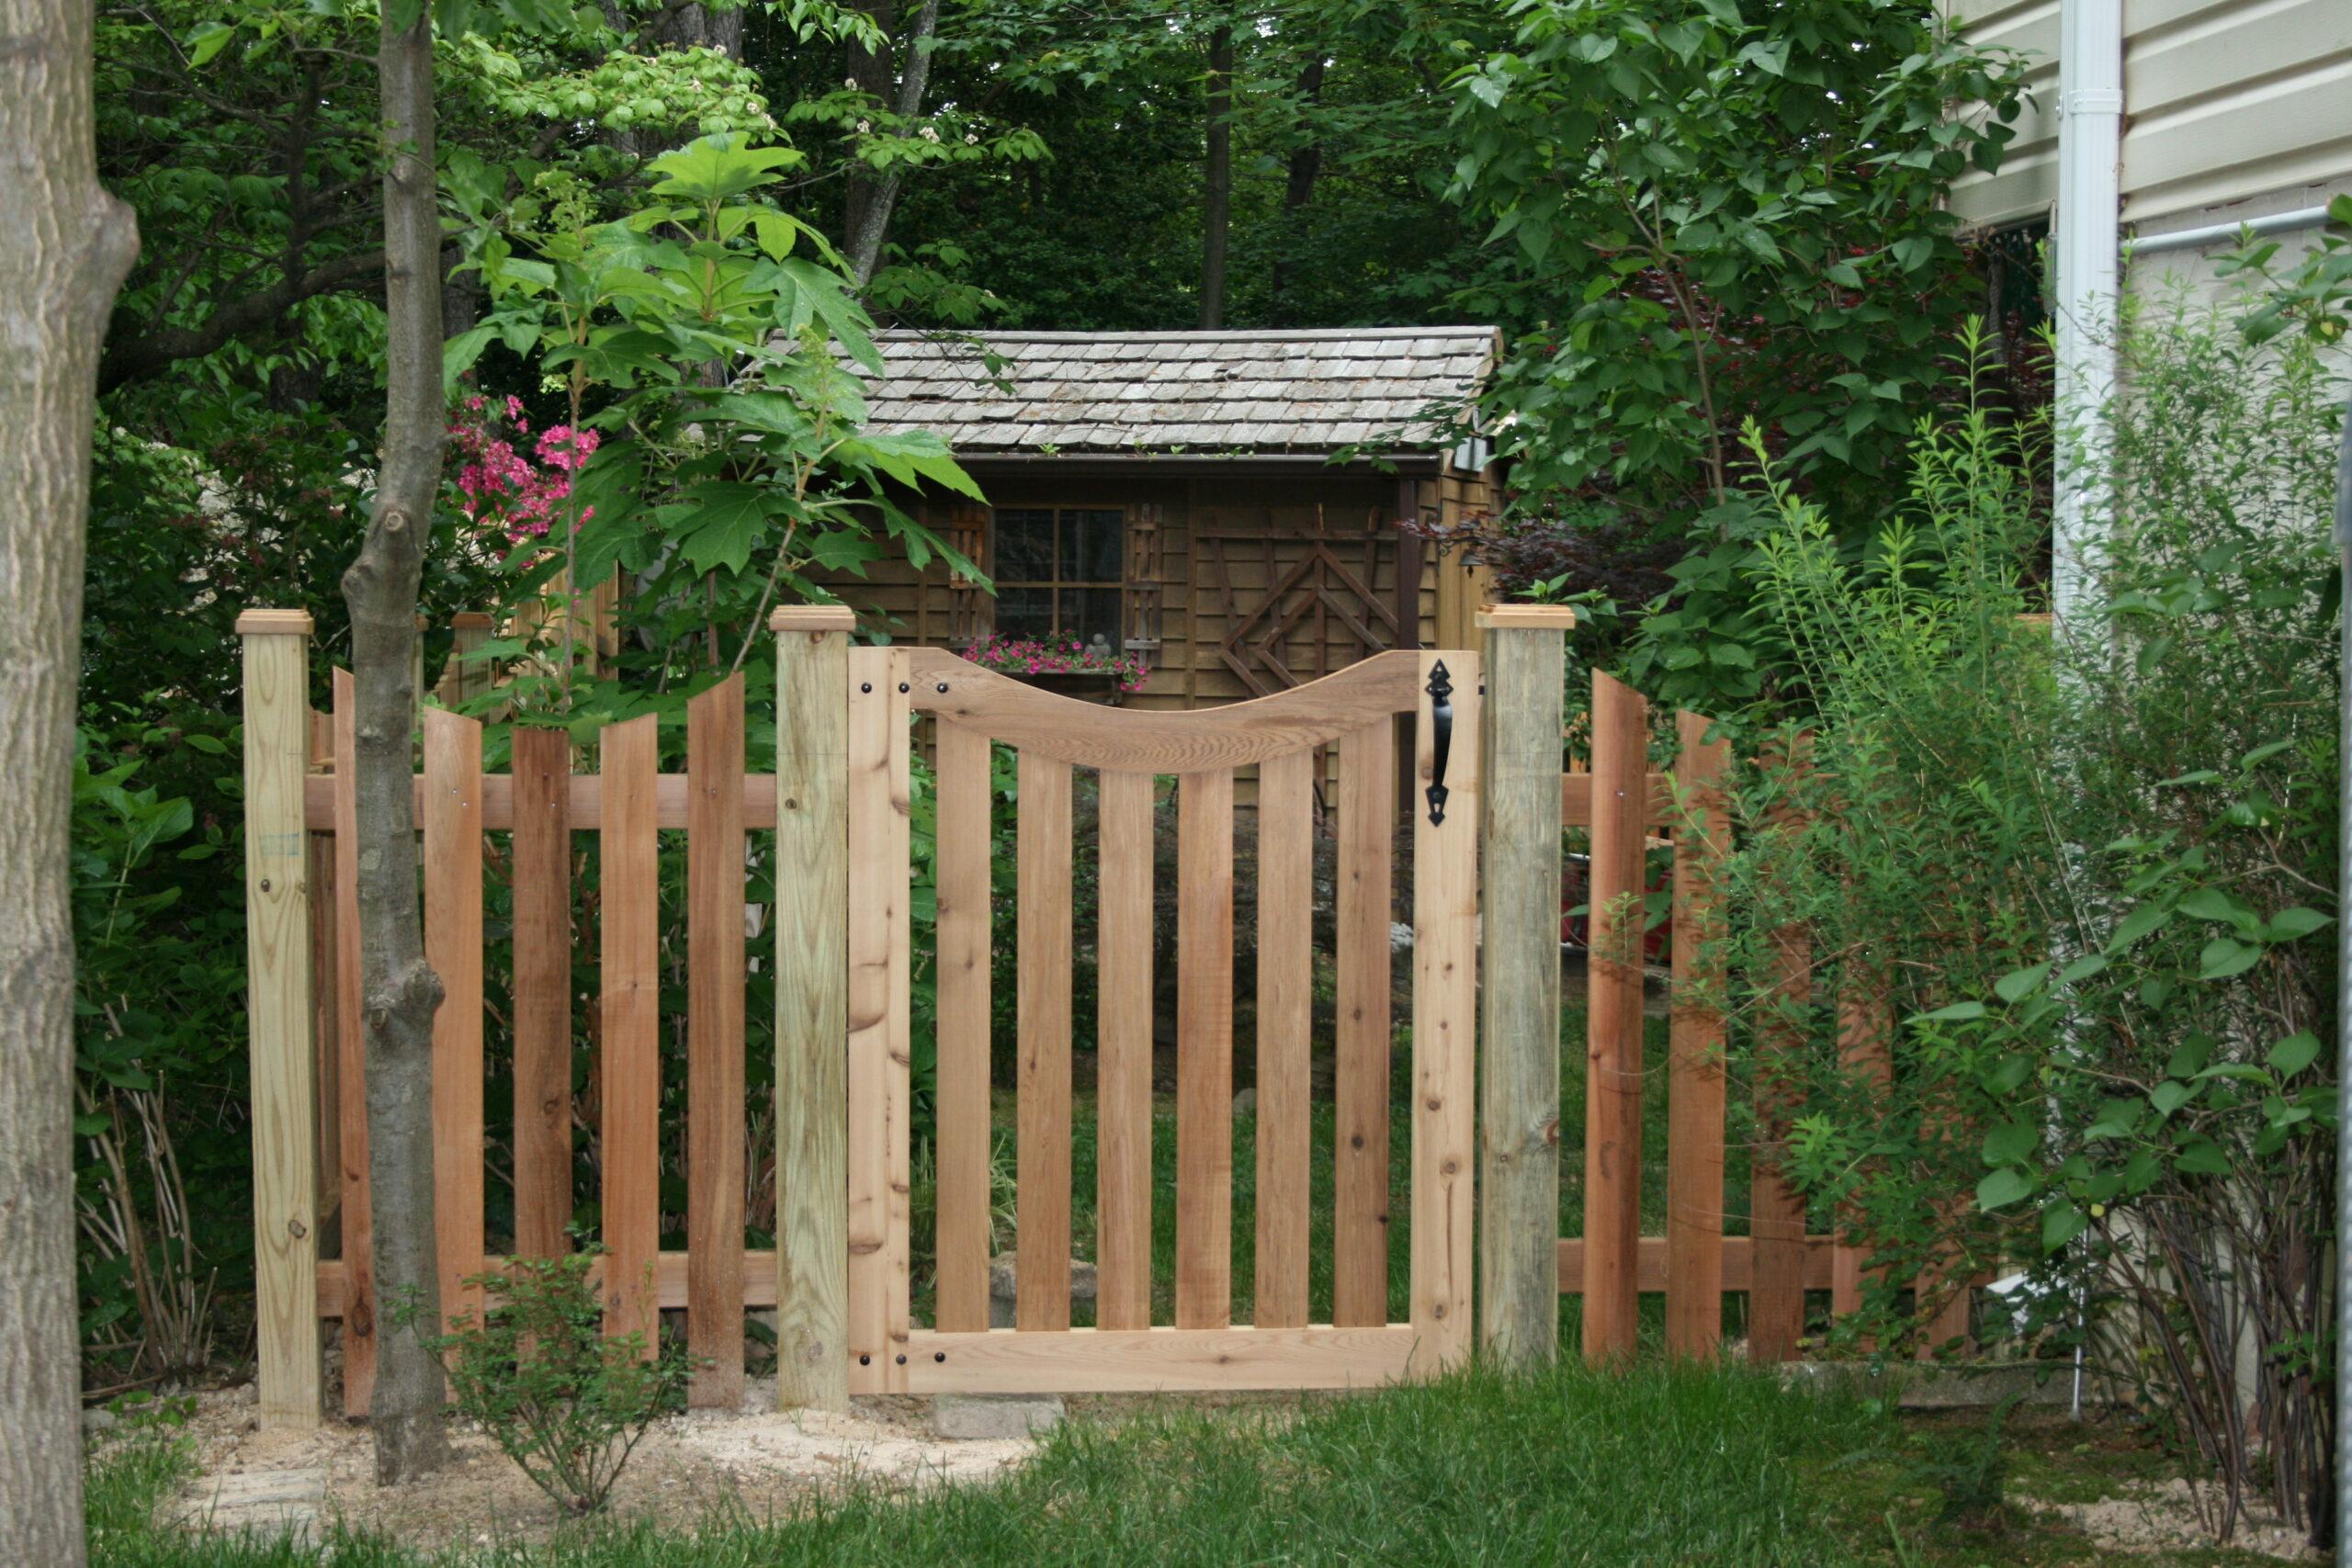 GATES (86)